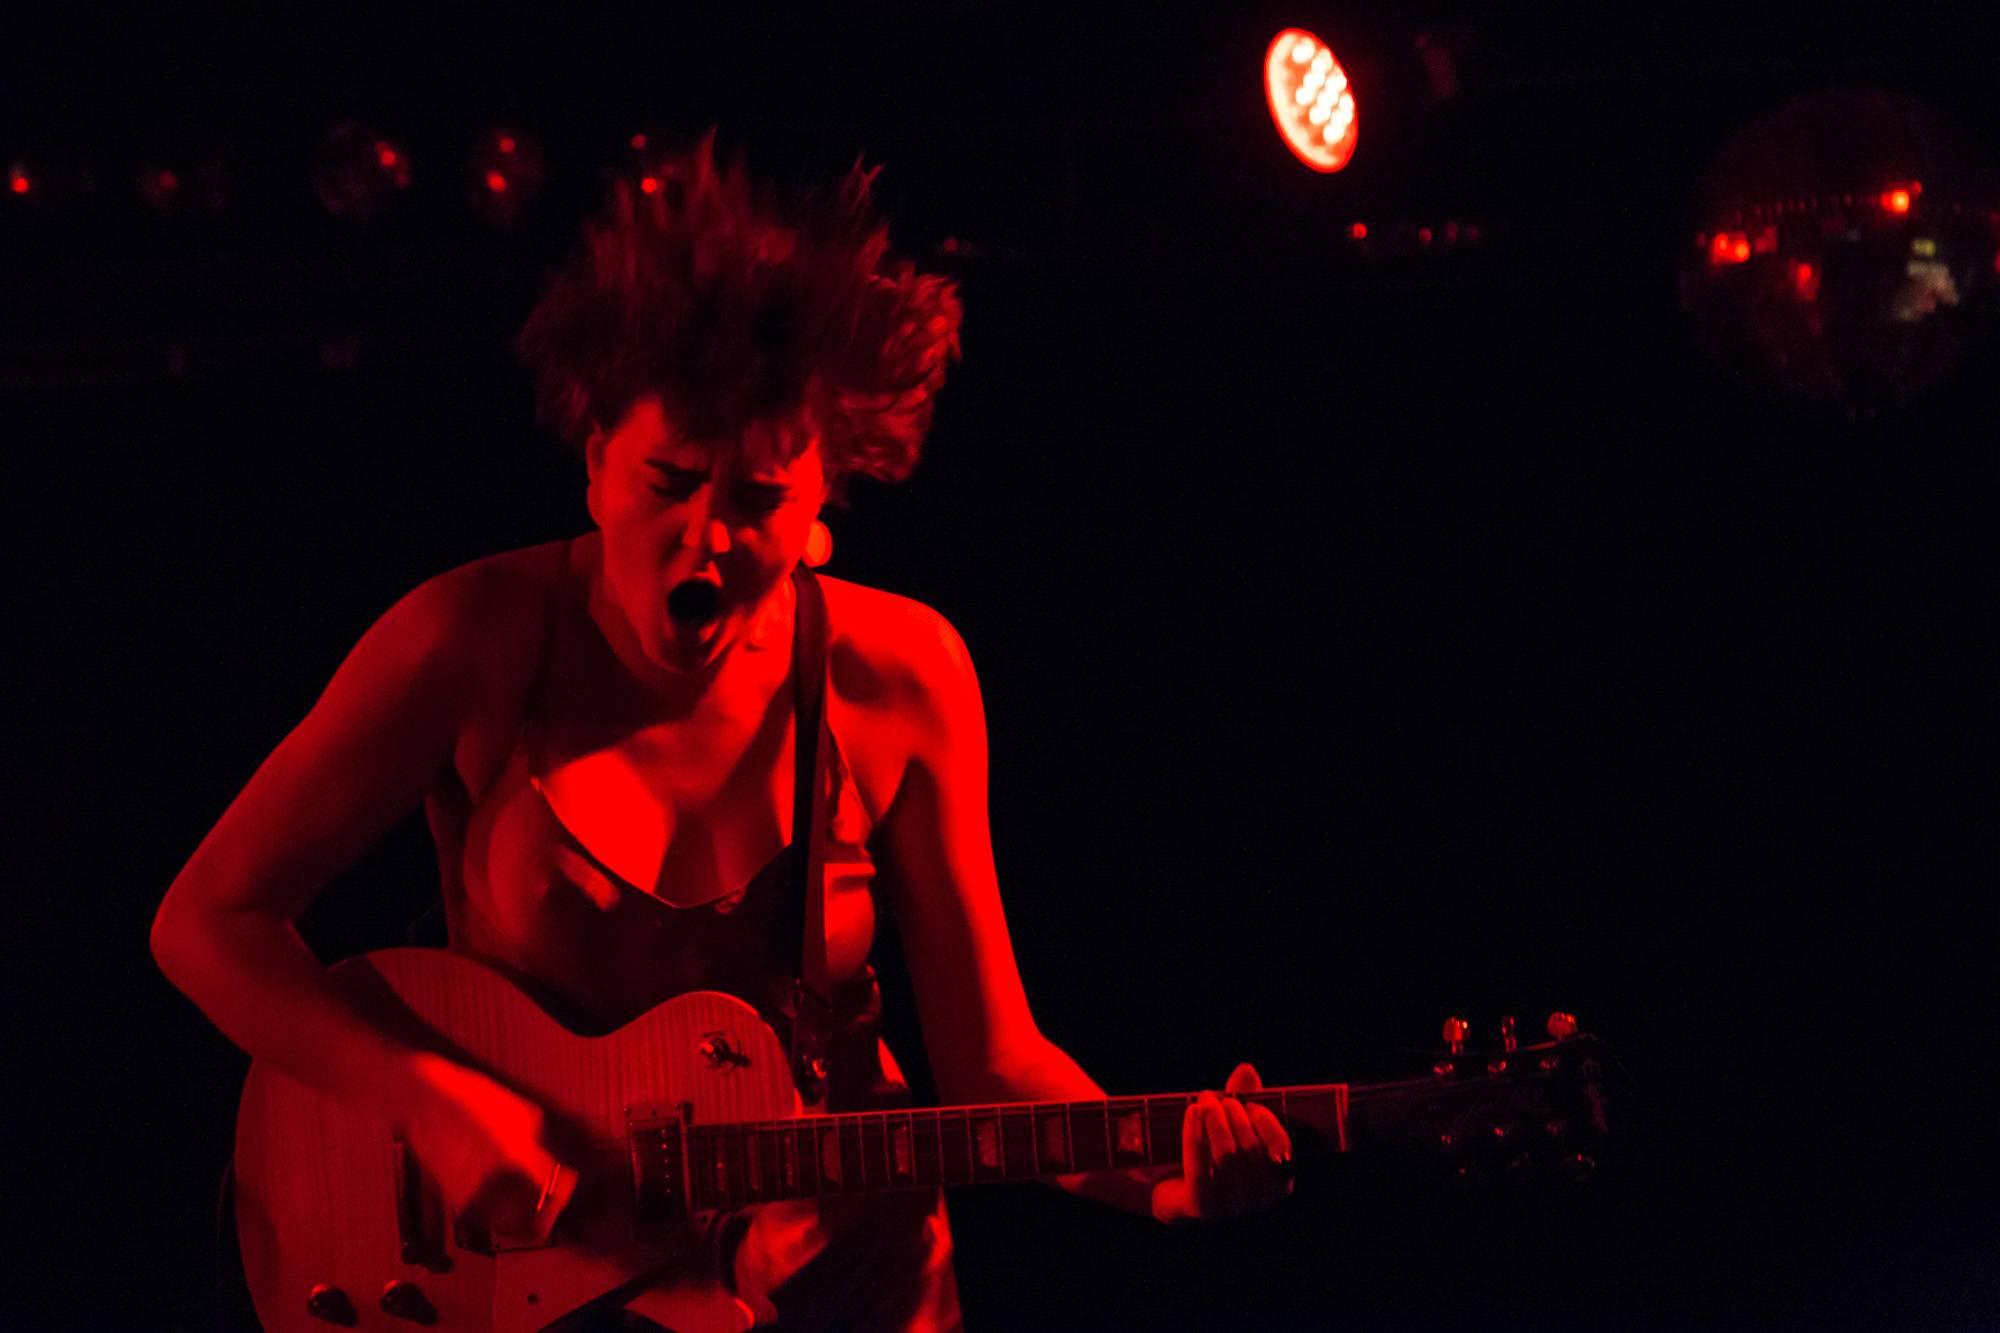 Francesca Belcourt at the Biltmore Cabaret, Vancouver, Nov. 16 2016. Kirk Chantraine photo.